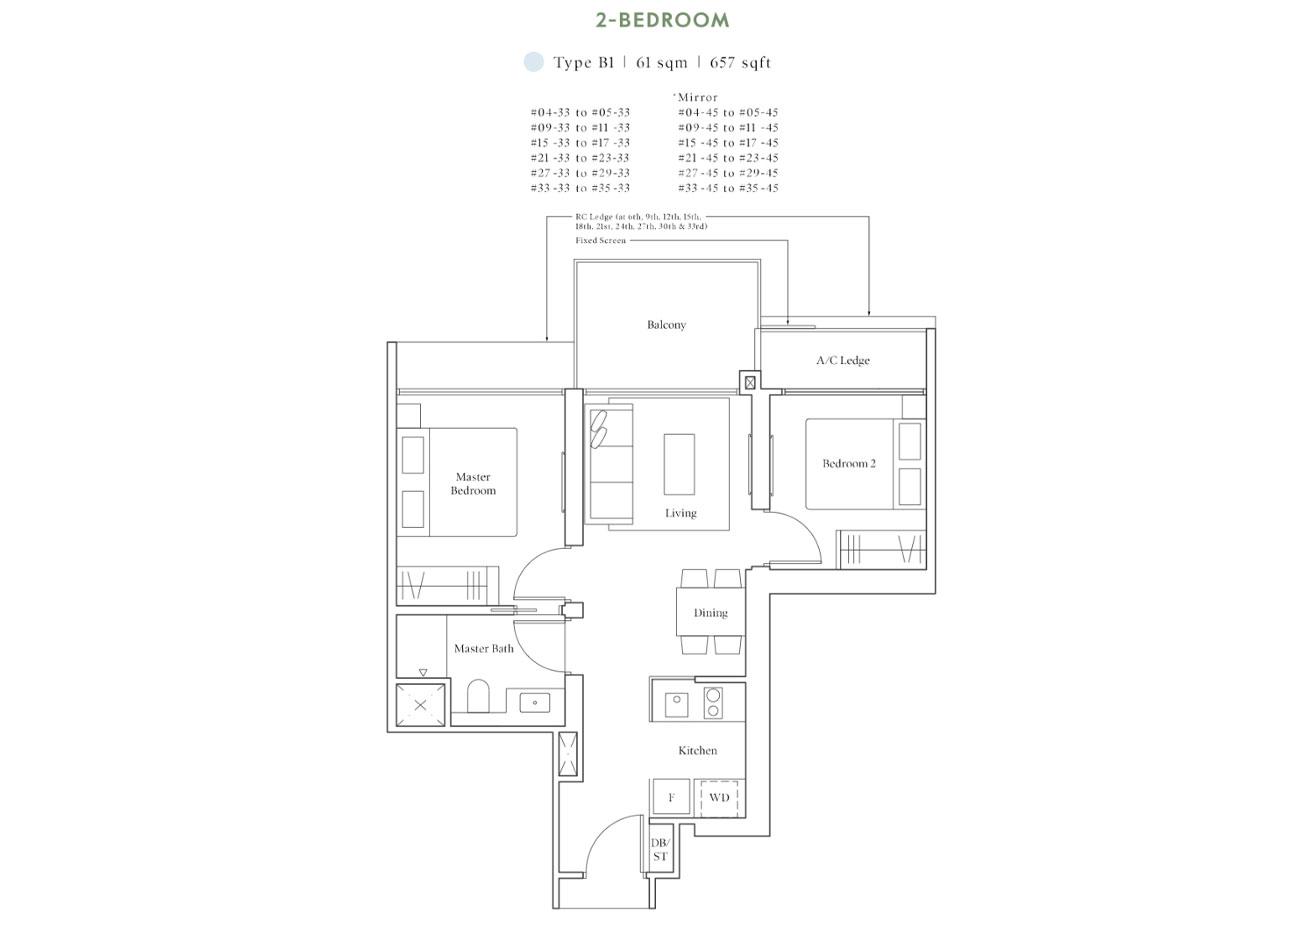 Horizon Collection - 2 Bedroom, B1